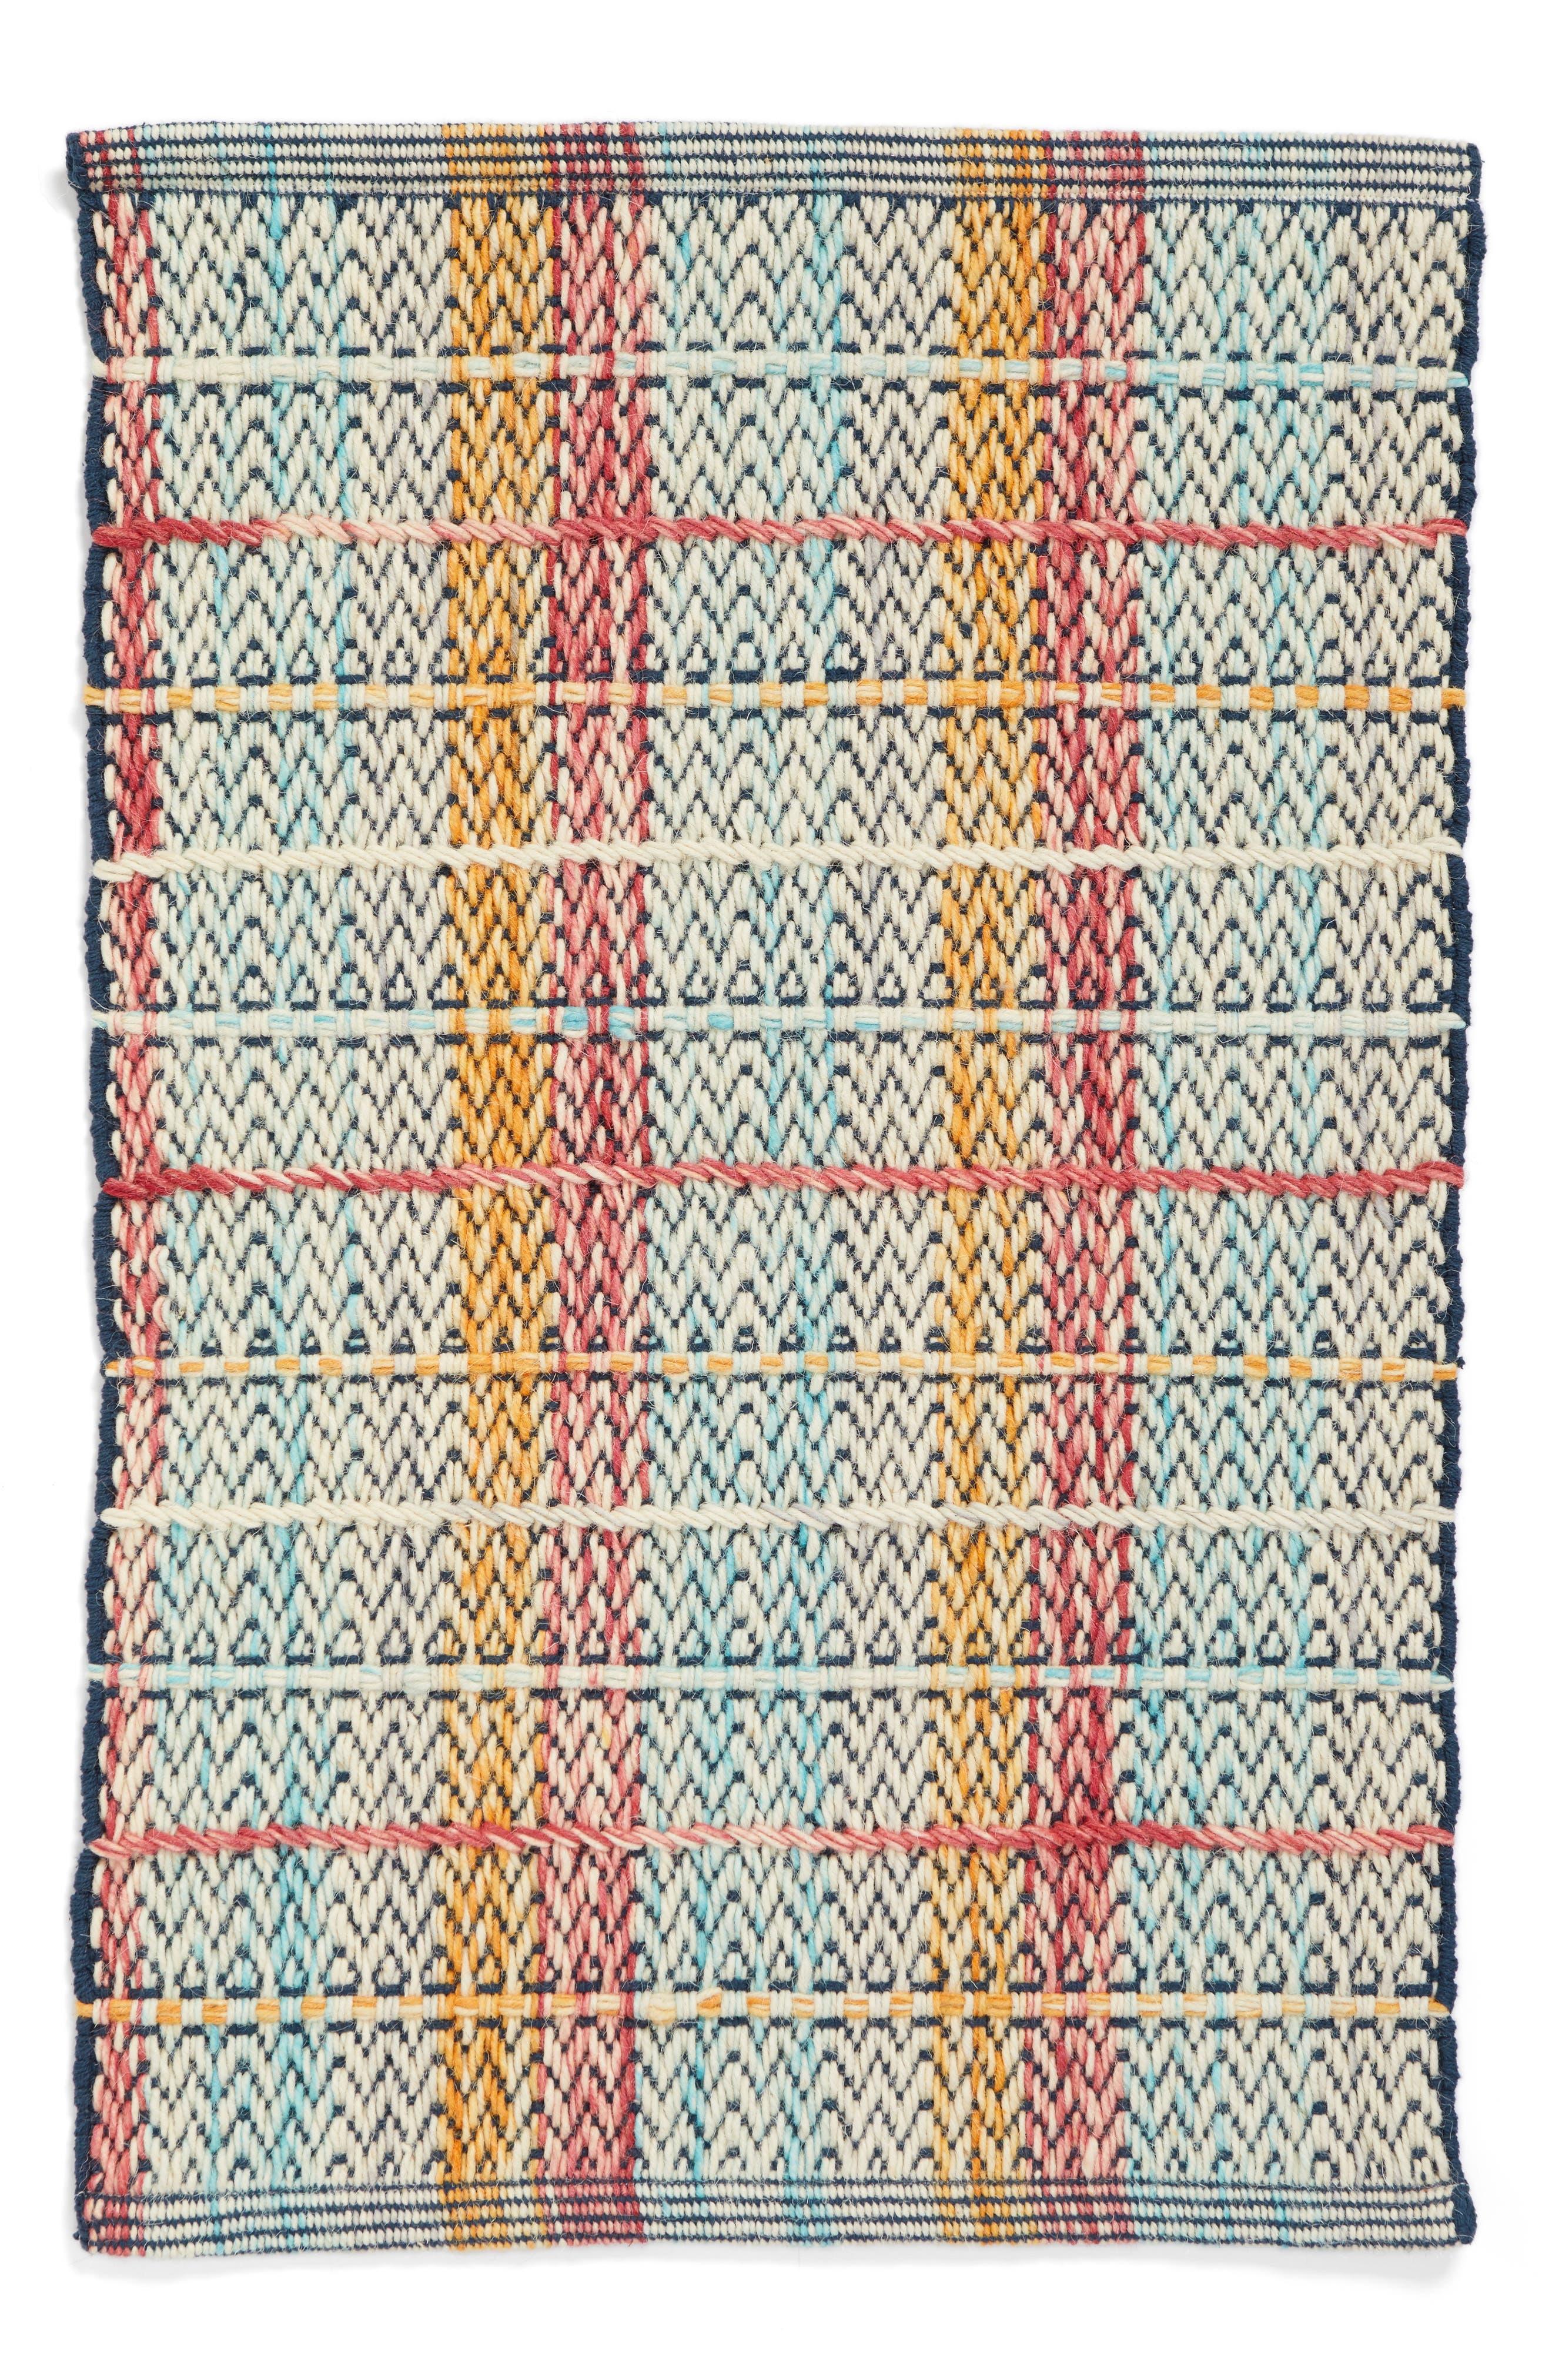 Stripe Handwoven Area Rug,                             Main thumbnail 1, color,                             900